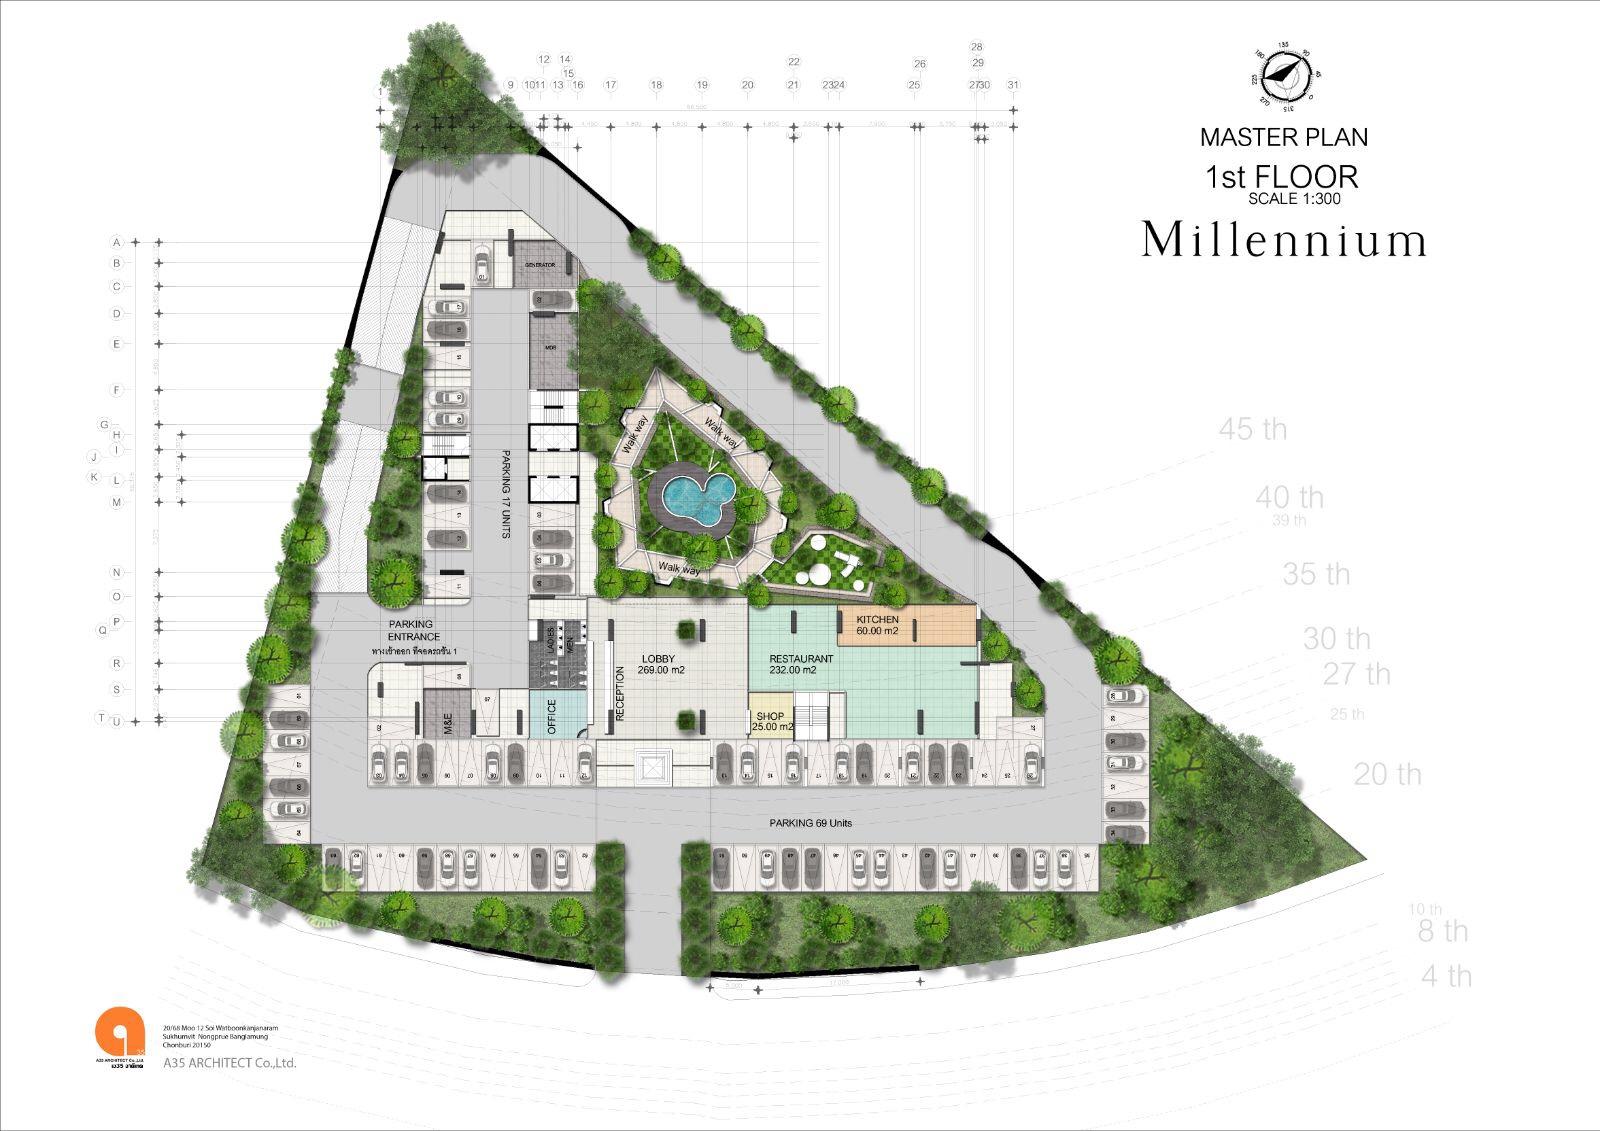 Master plan - 1st floor